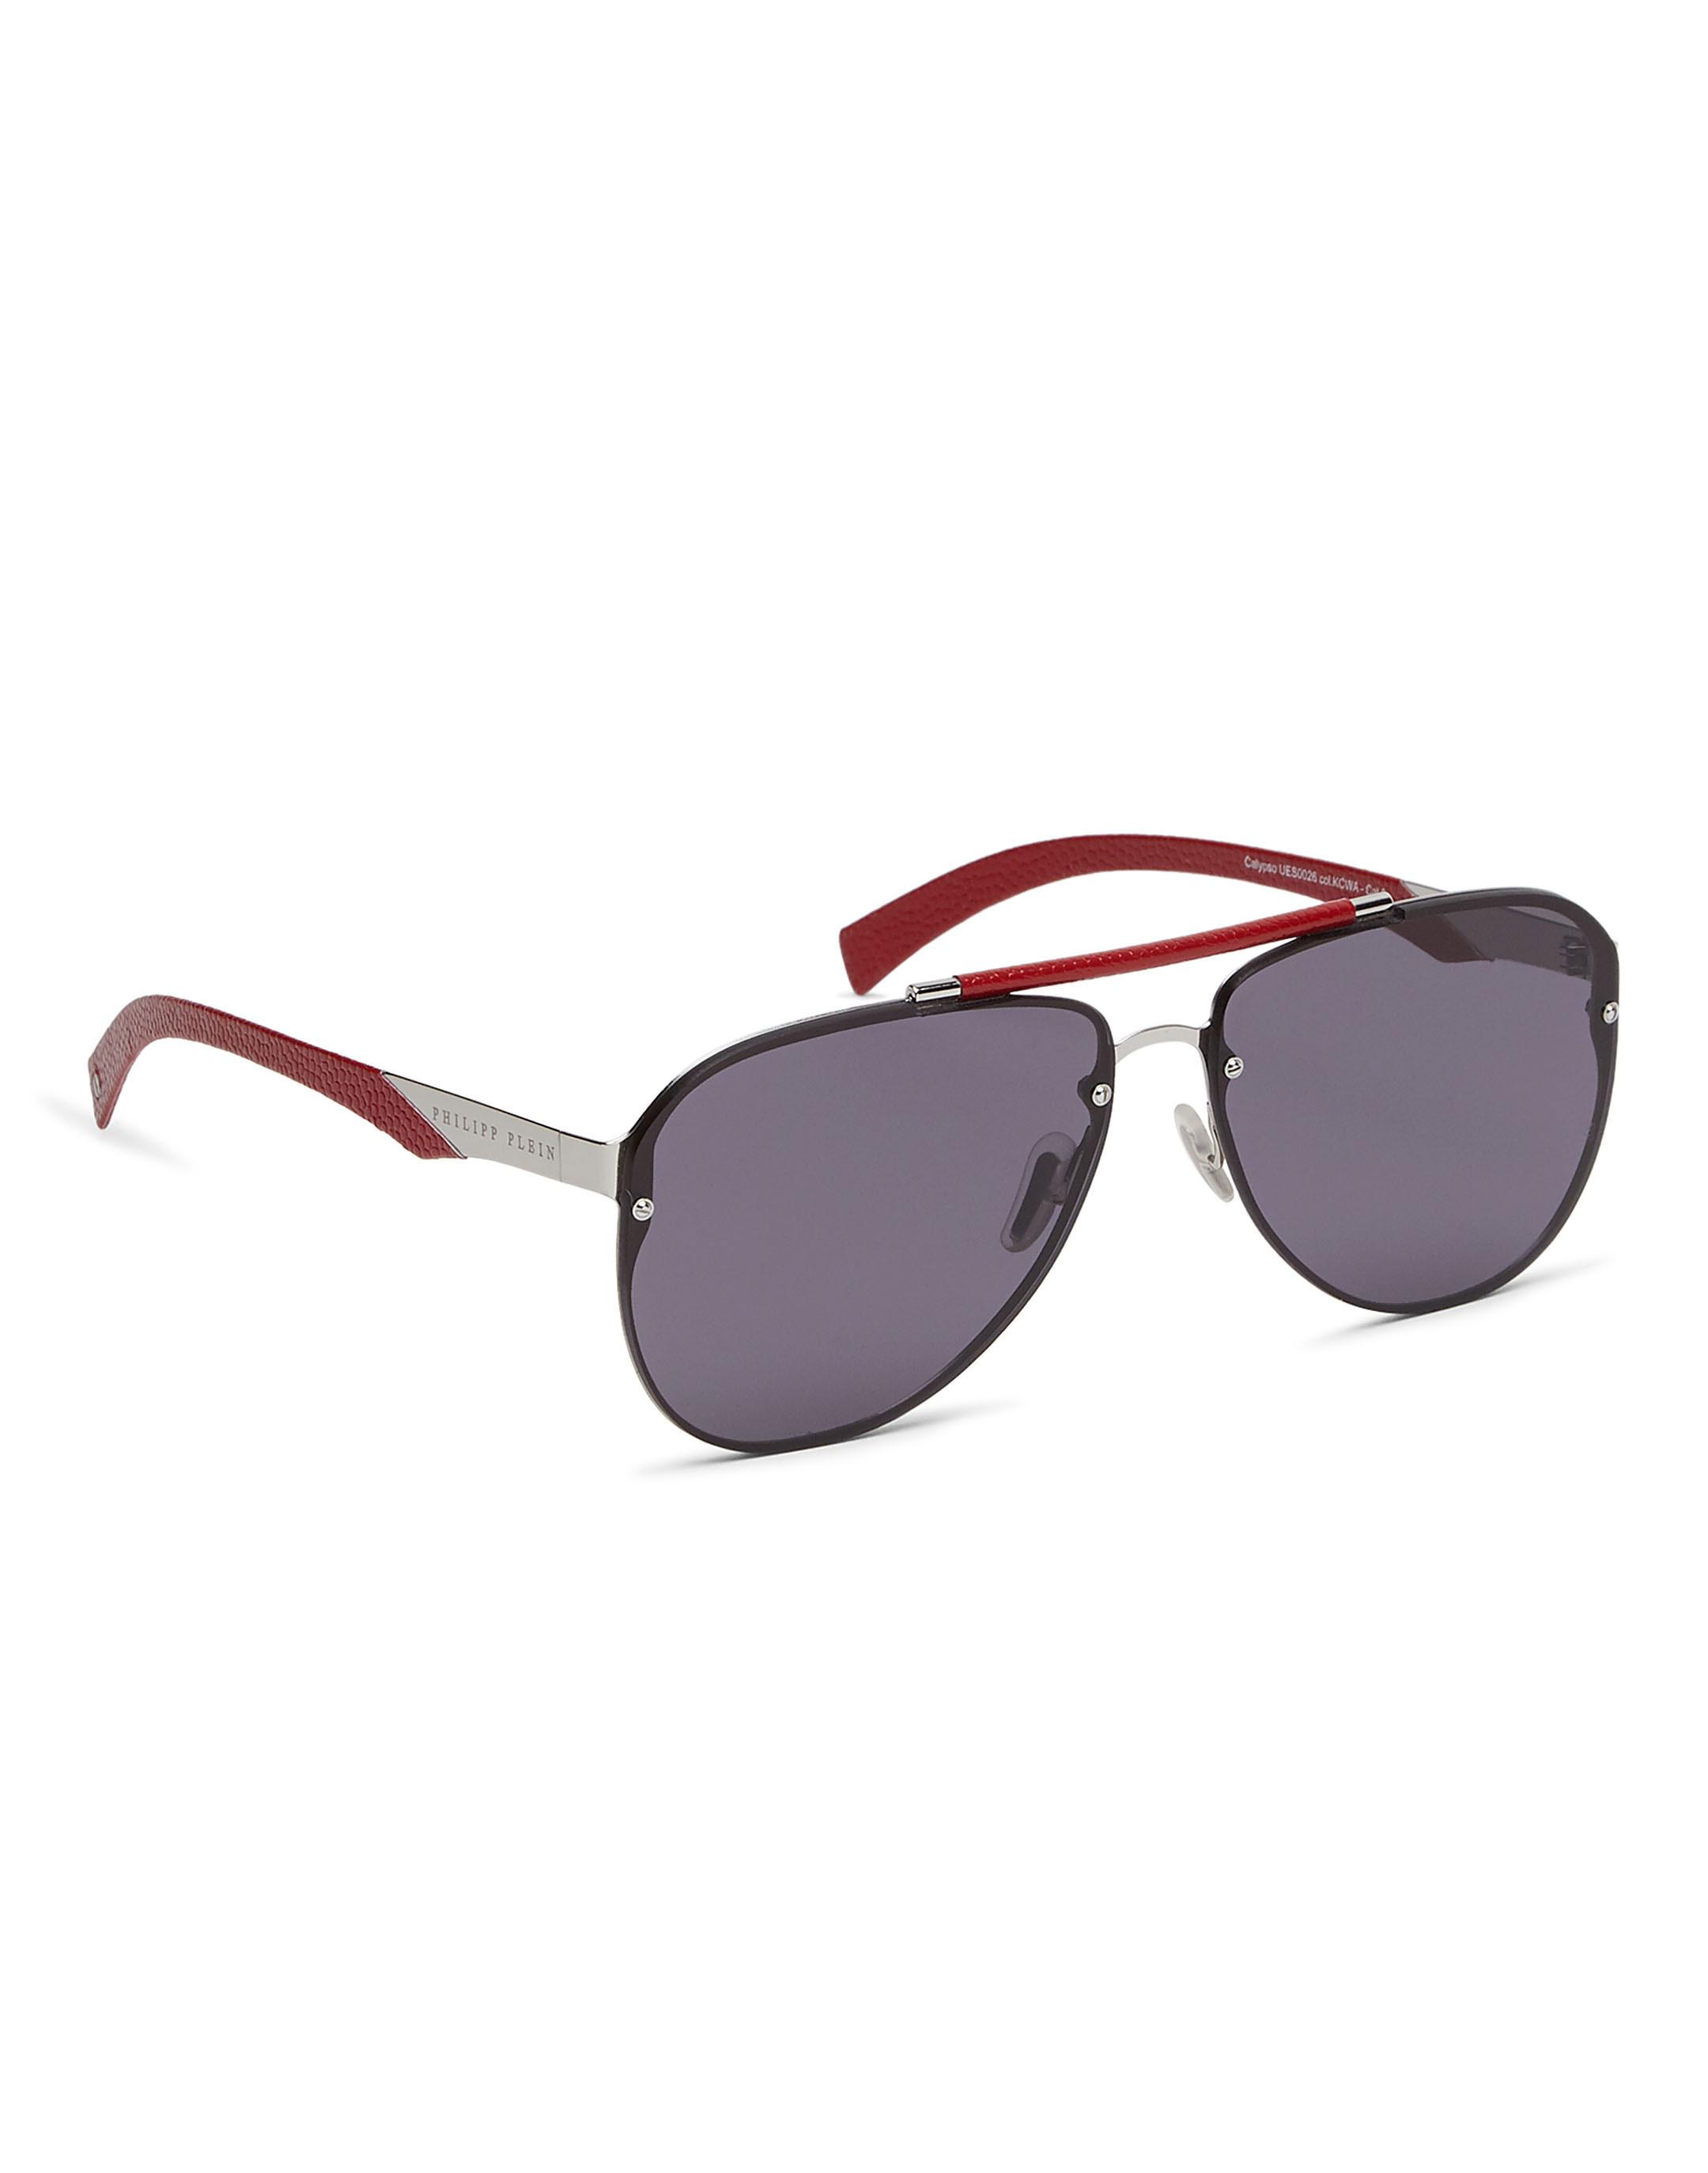 Calypso Philipp Plein Sunglasses Sunglasses Basic Calypso wC186